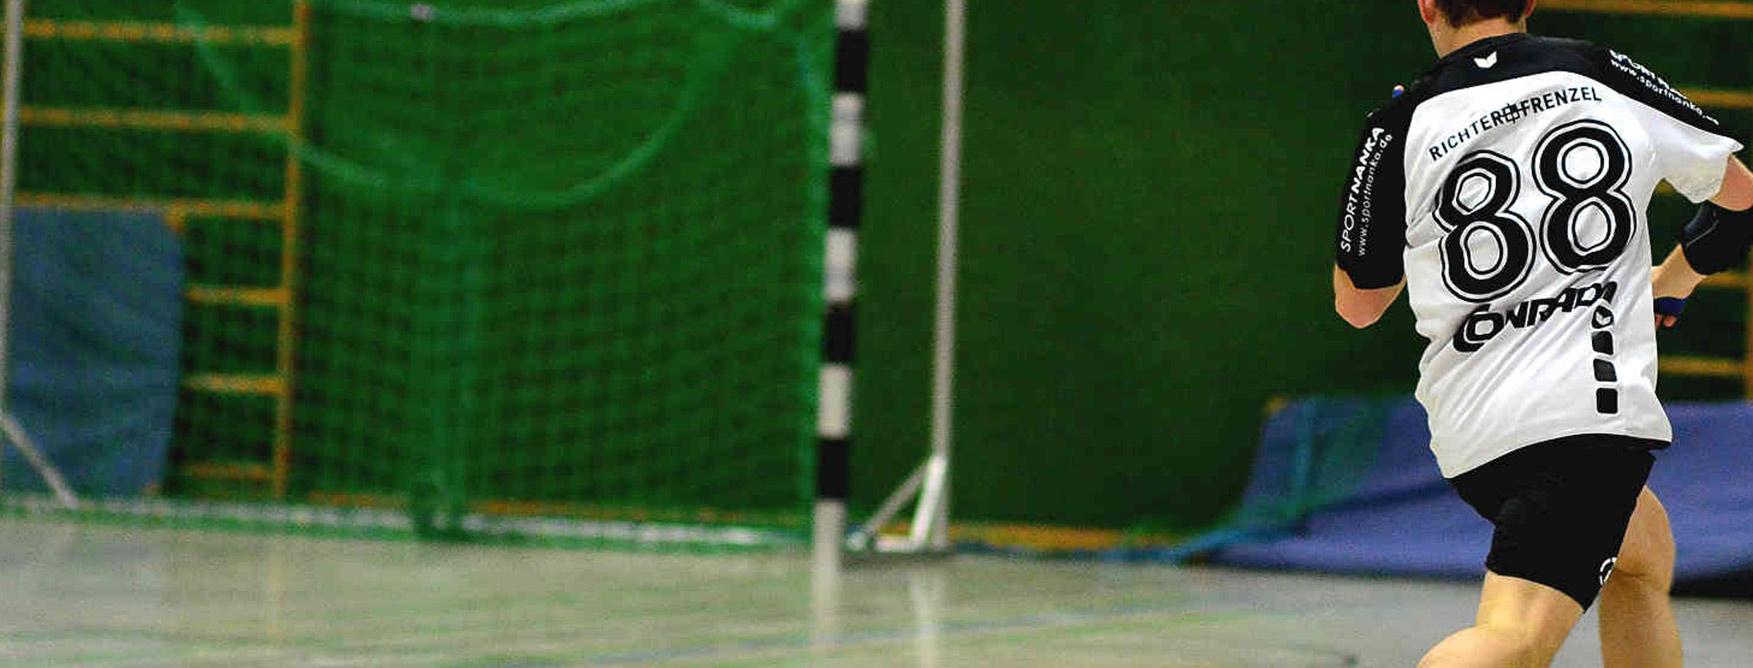 HC-Sulzbach-Handball-Tor